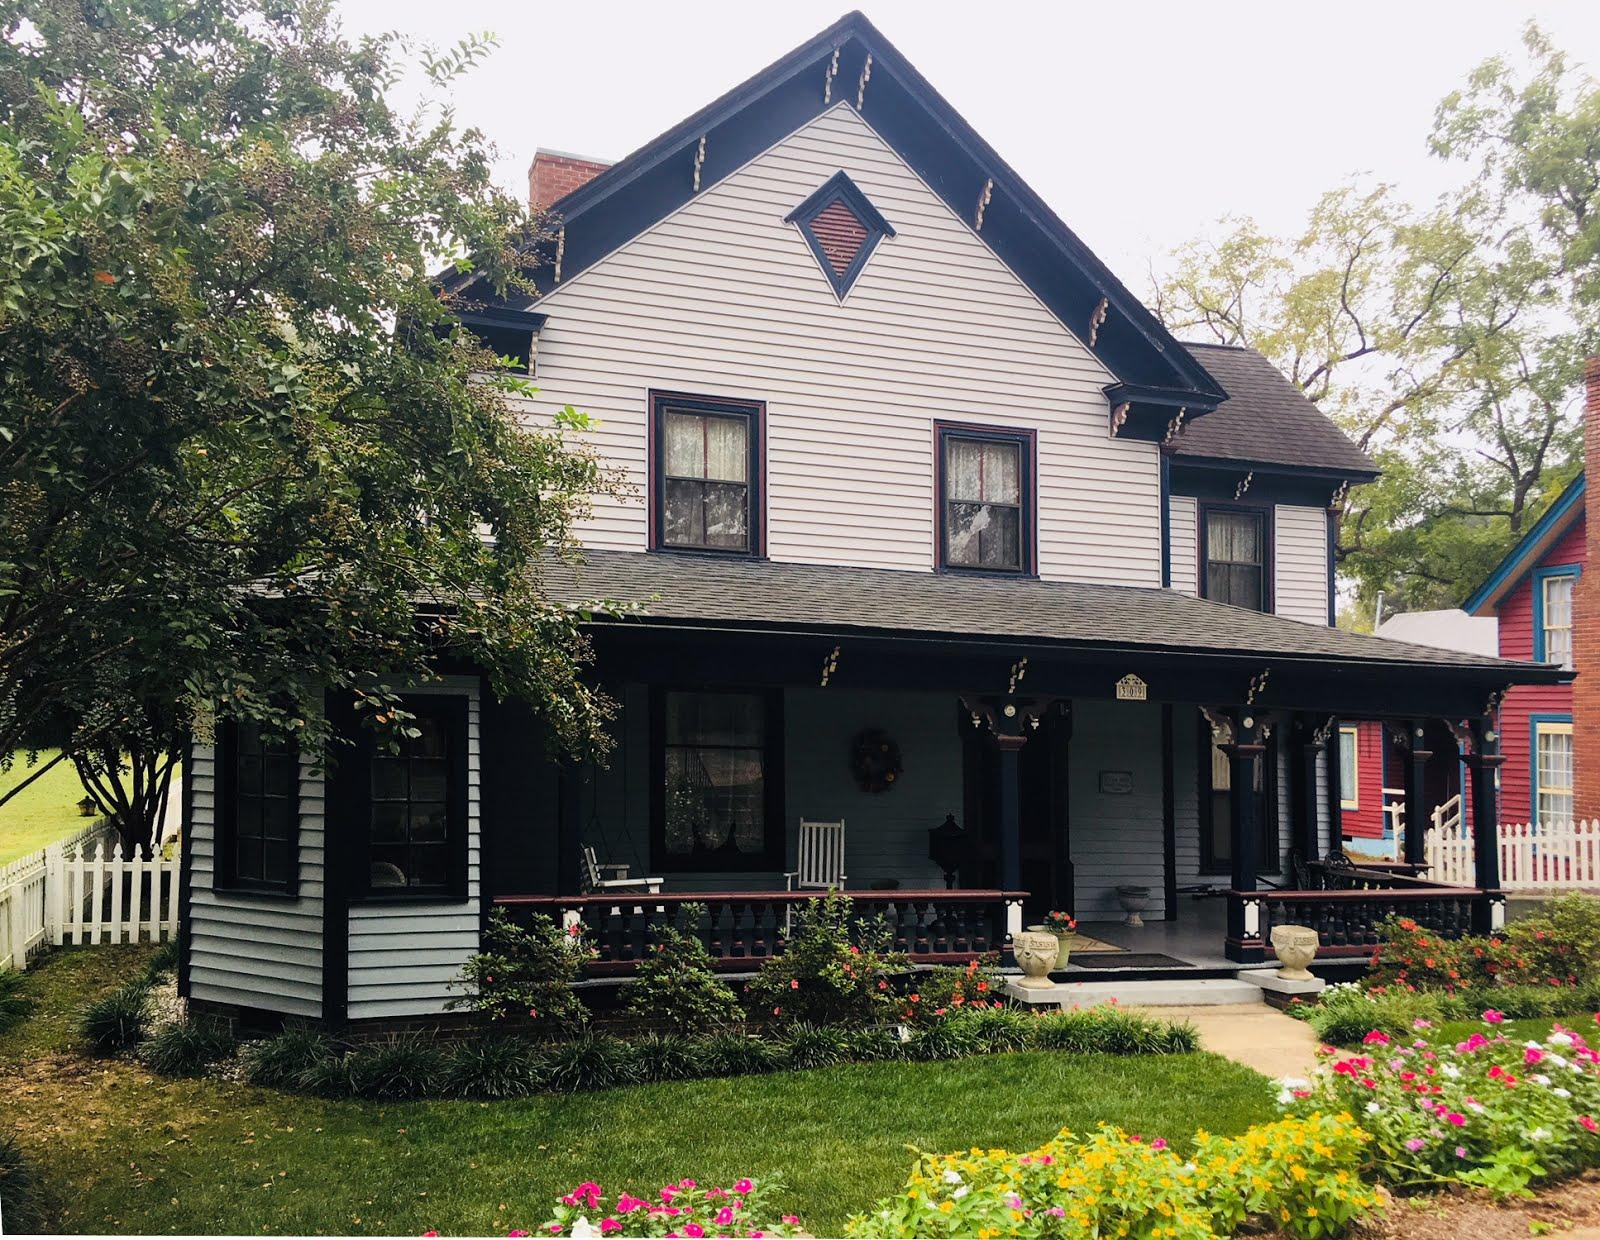 309 E. Bank Street, Salisbury NC 28144 ~ circa 1885 ~ $192,900